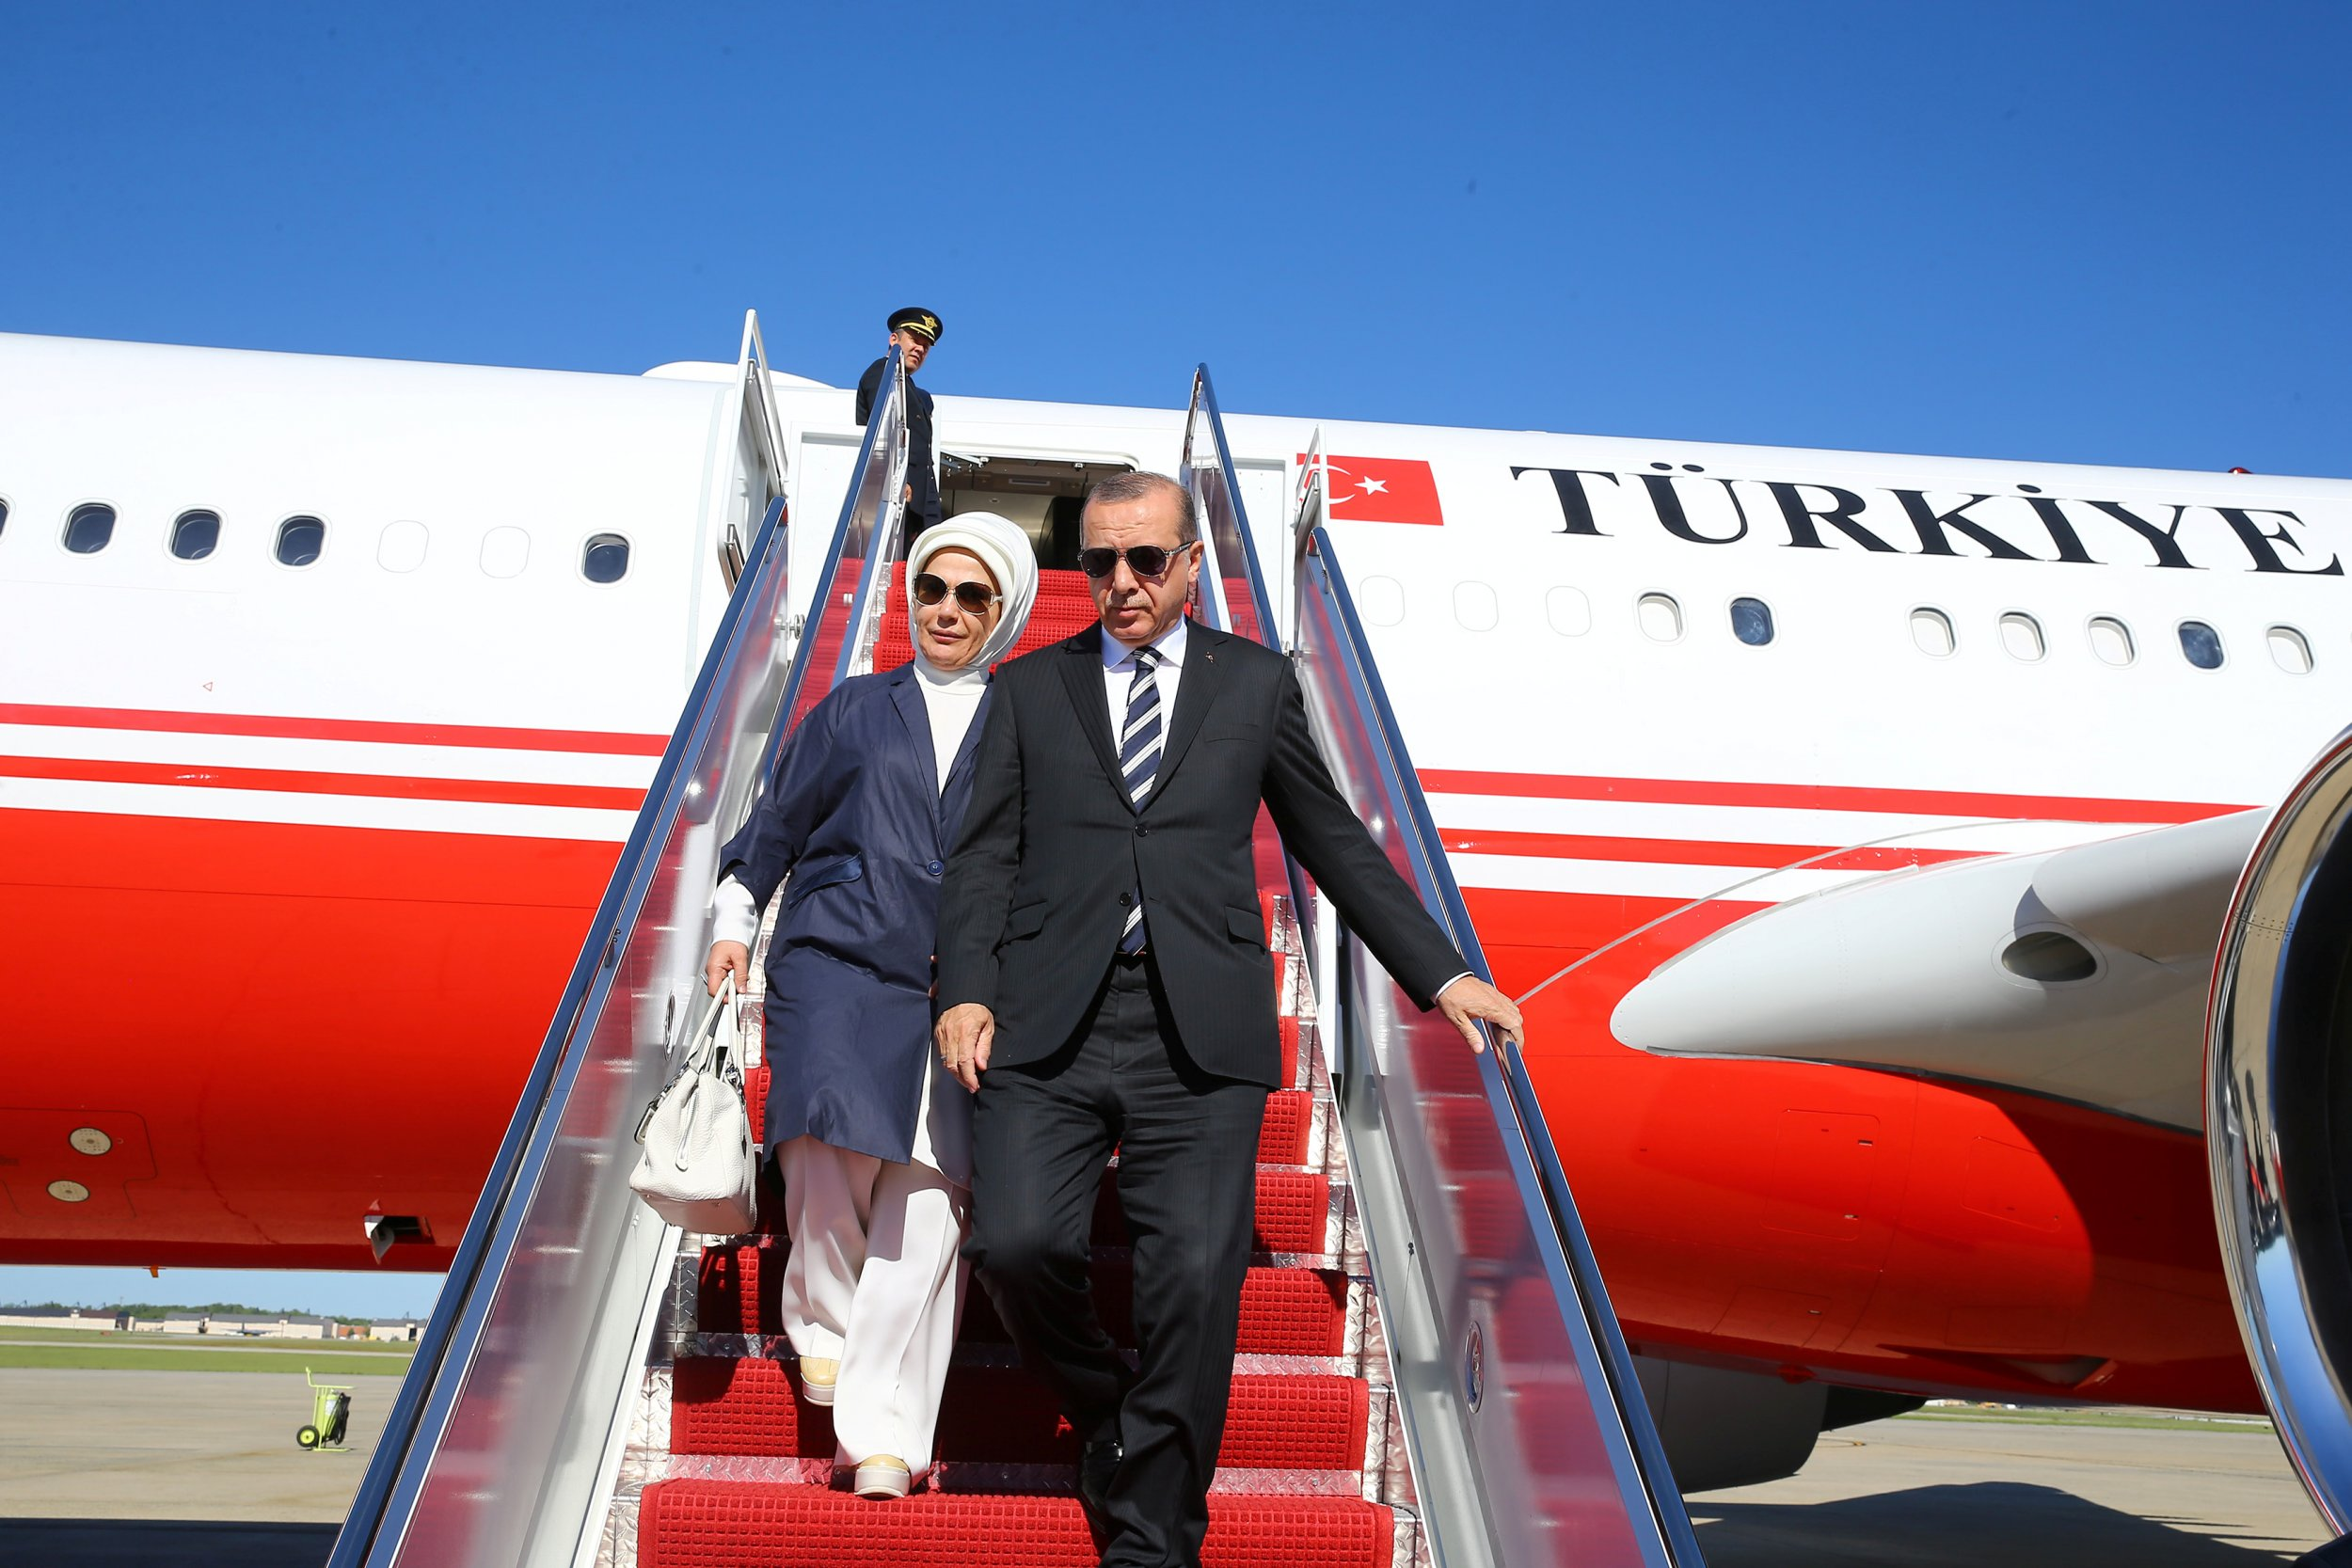 Glavna razlika između Istanbula i Sarajeva je da Istanbulom trenutno ne vlada Erdogan